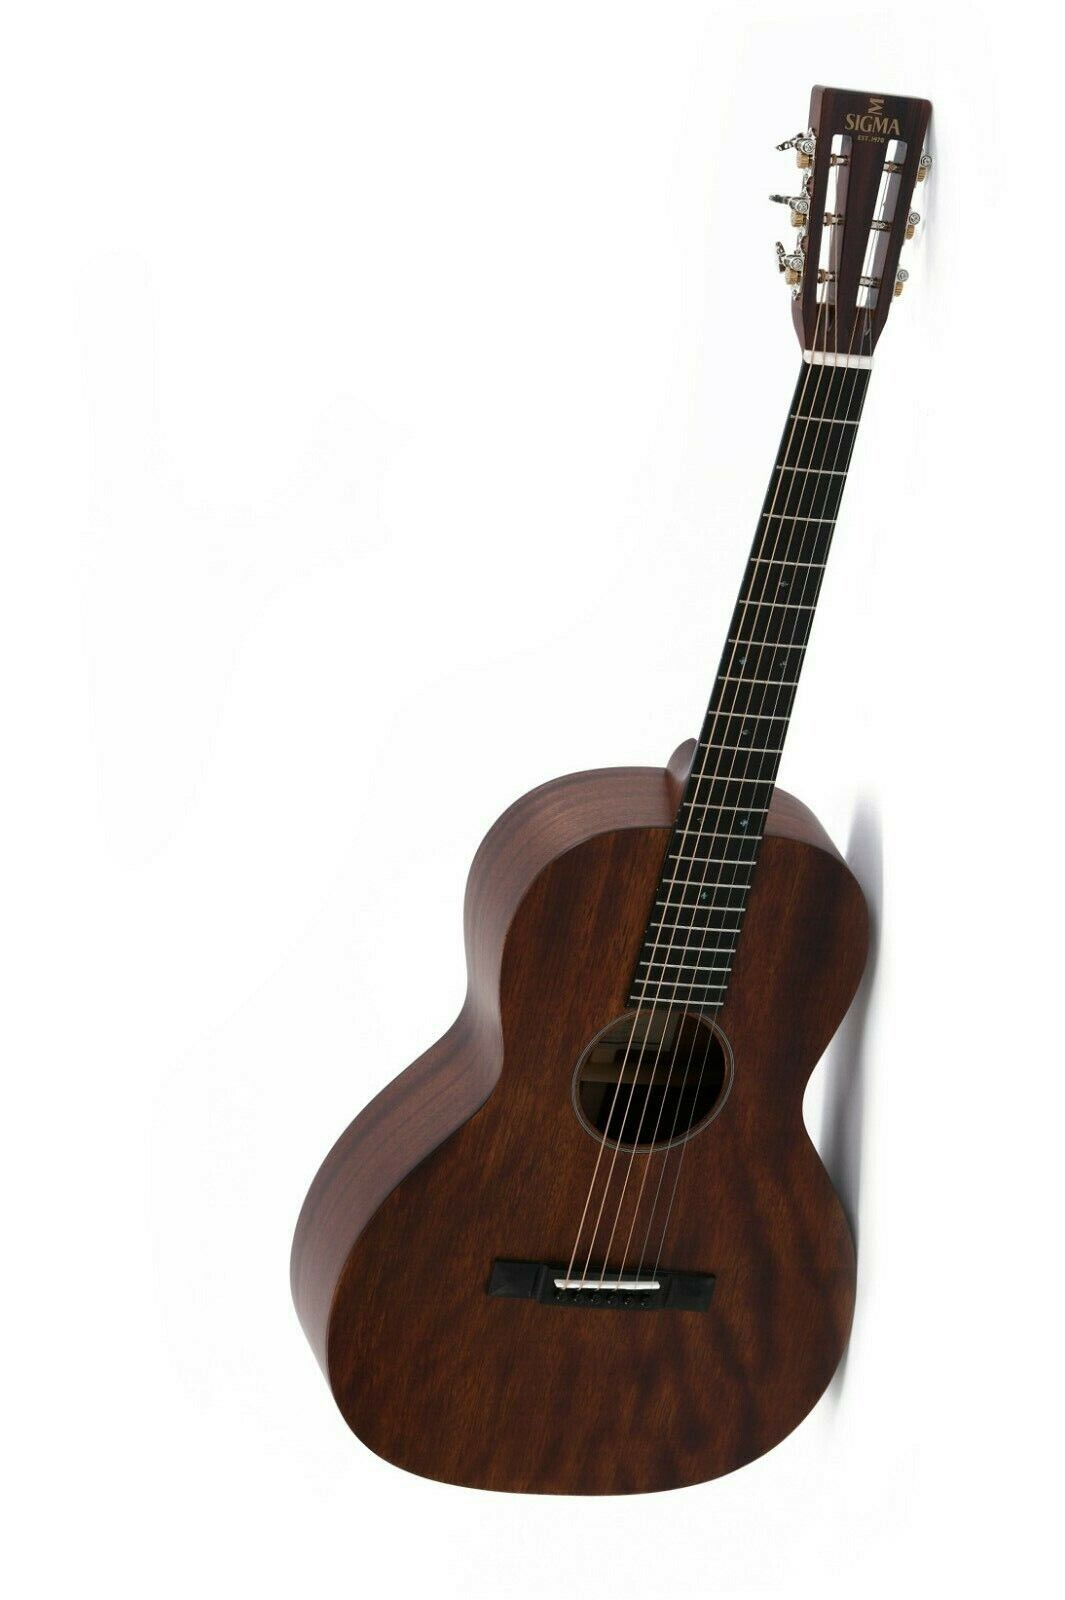 SIGMA GUITARS- Gitarre 000M-15S+ Mahagonikorpus offene slotted Kopfplatte 1.WAHL